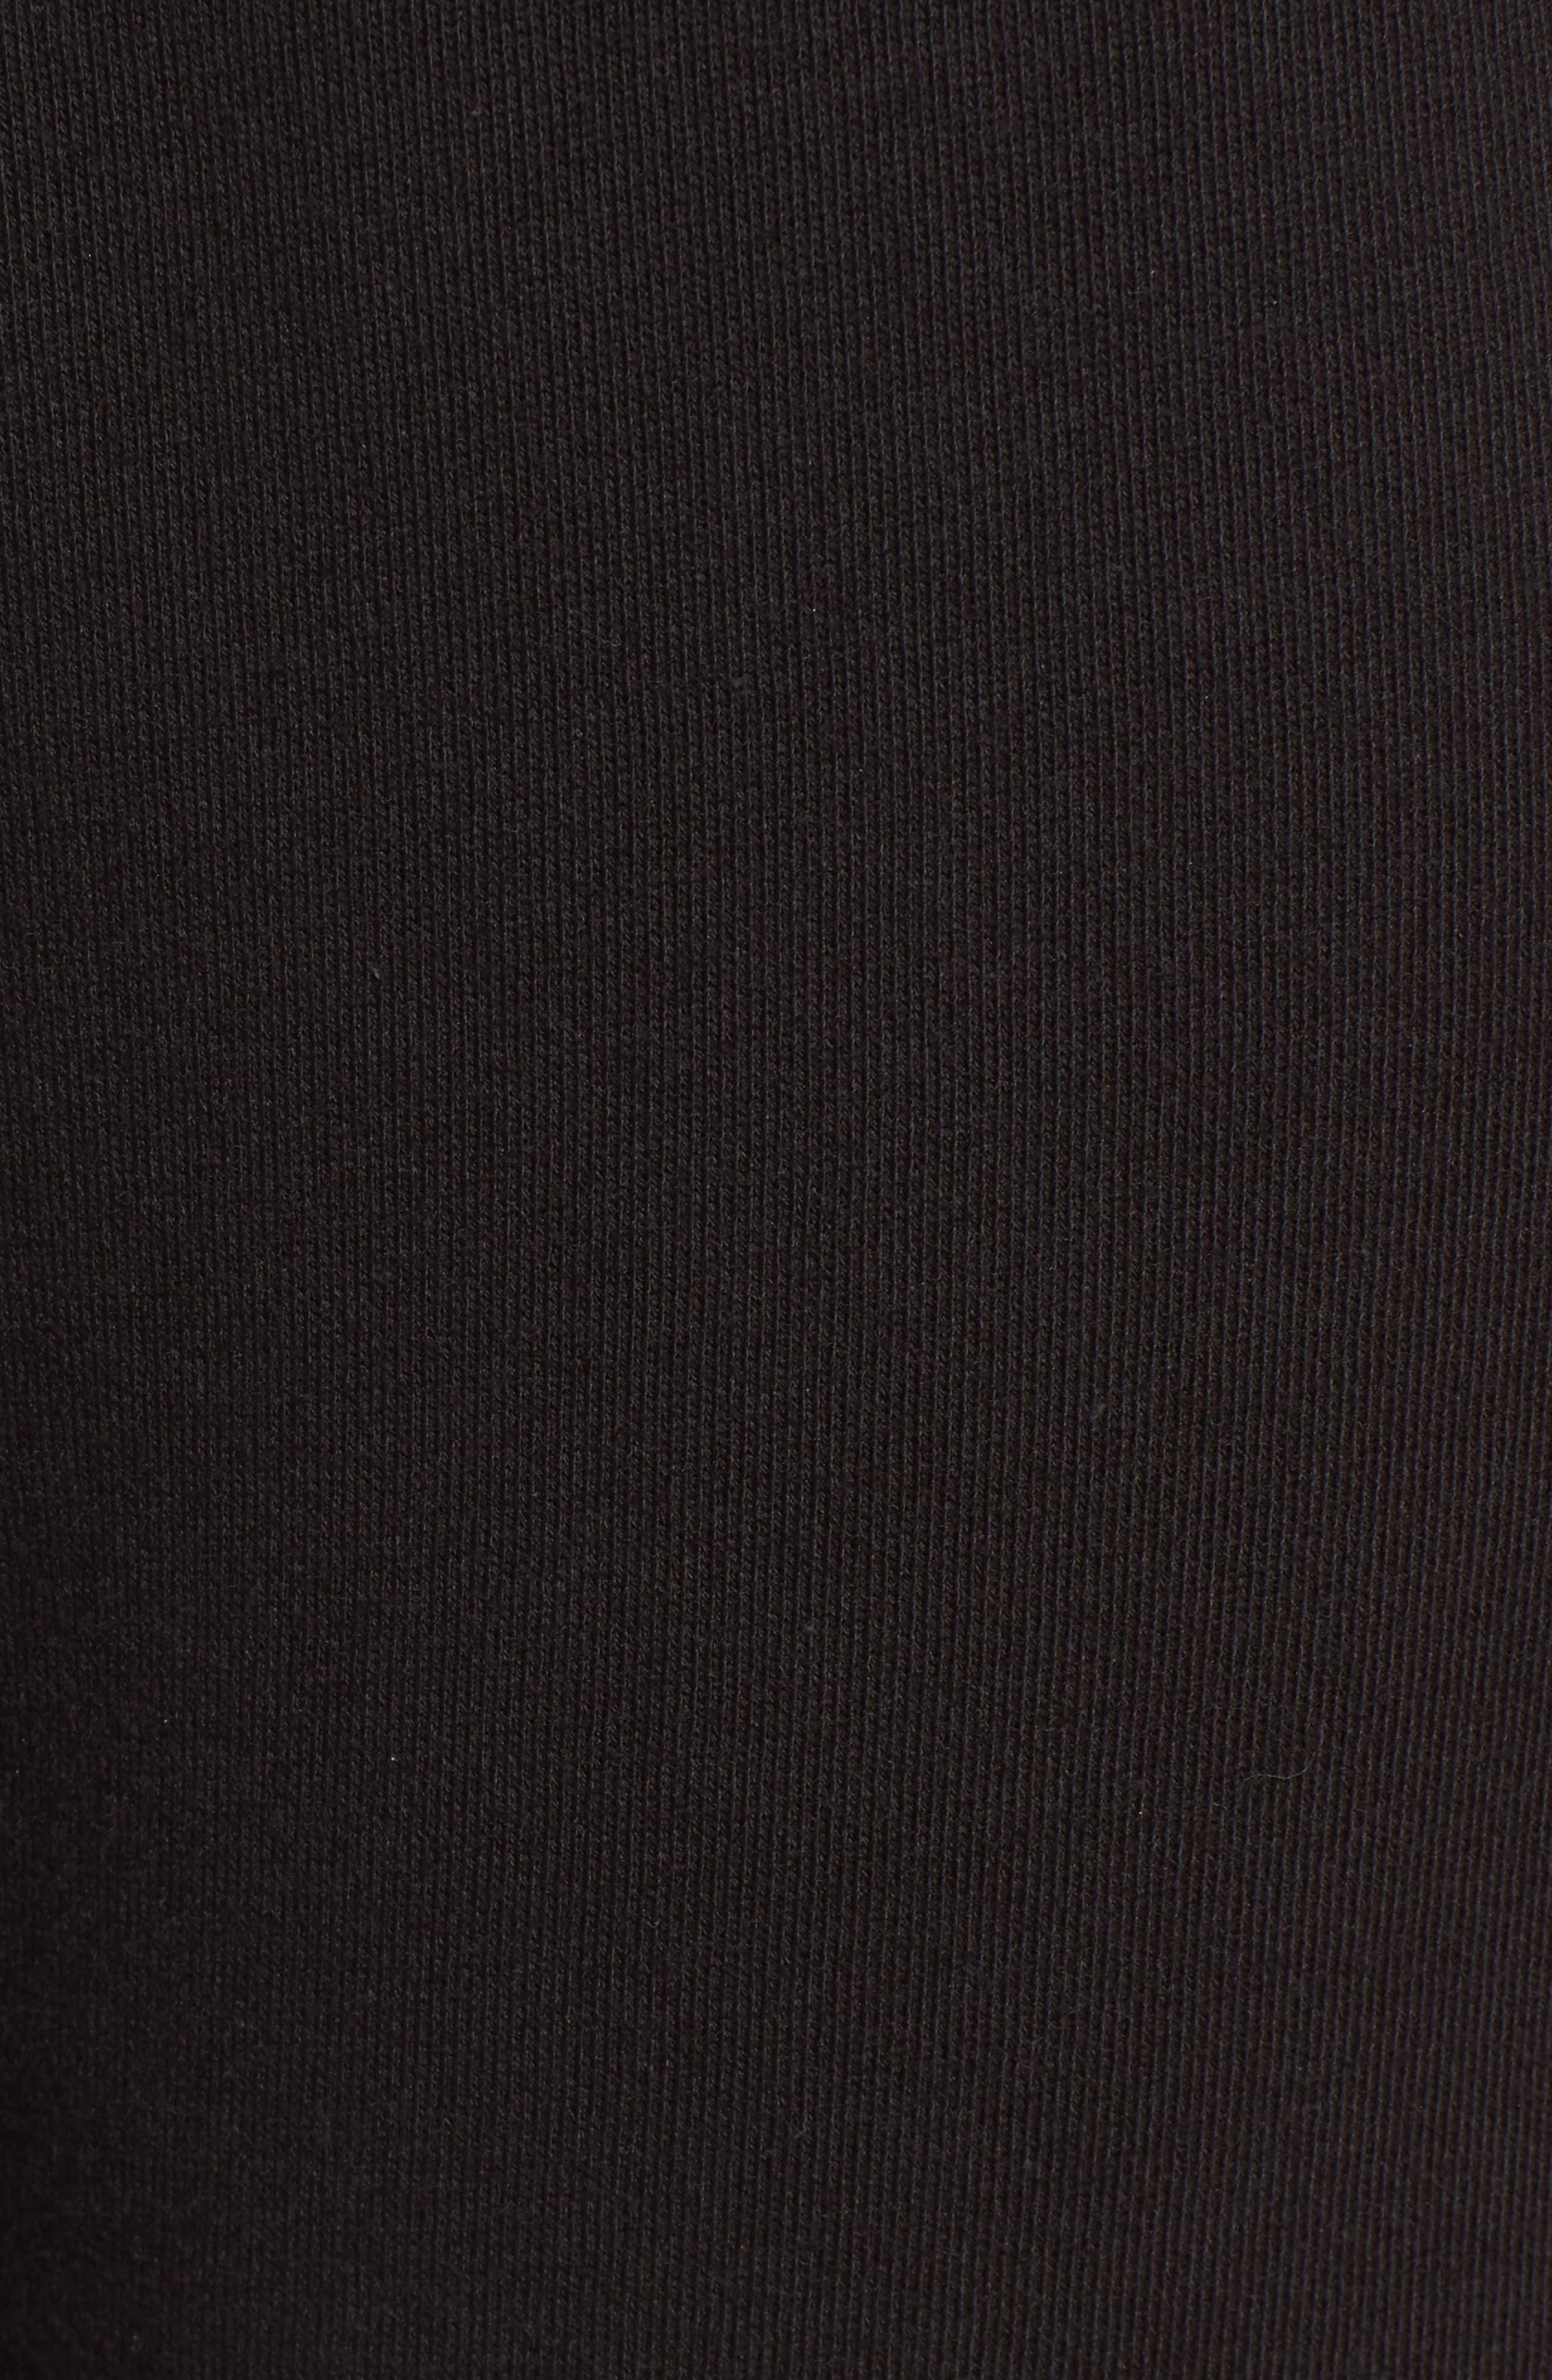 Vol Tower Sweatpants,                             Alternate thumbnail 5, color,                             Black